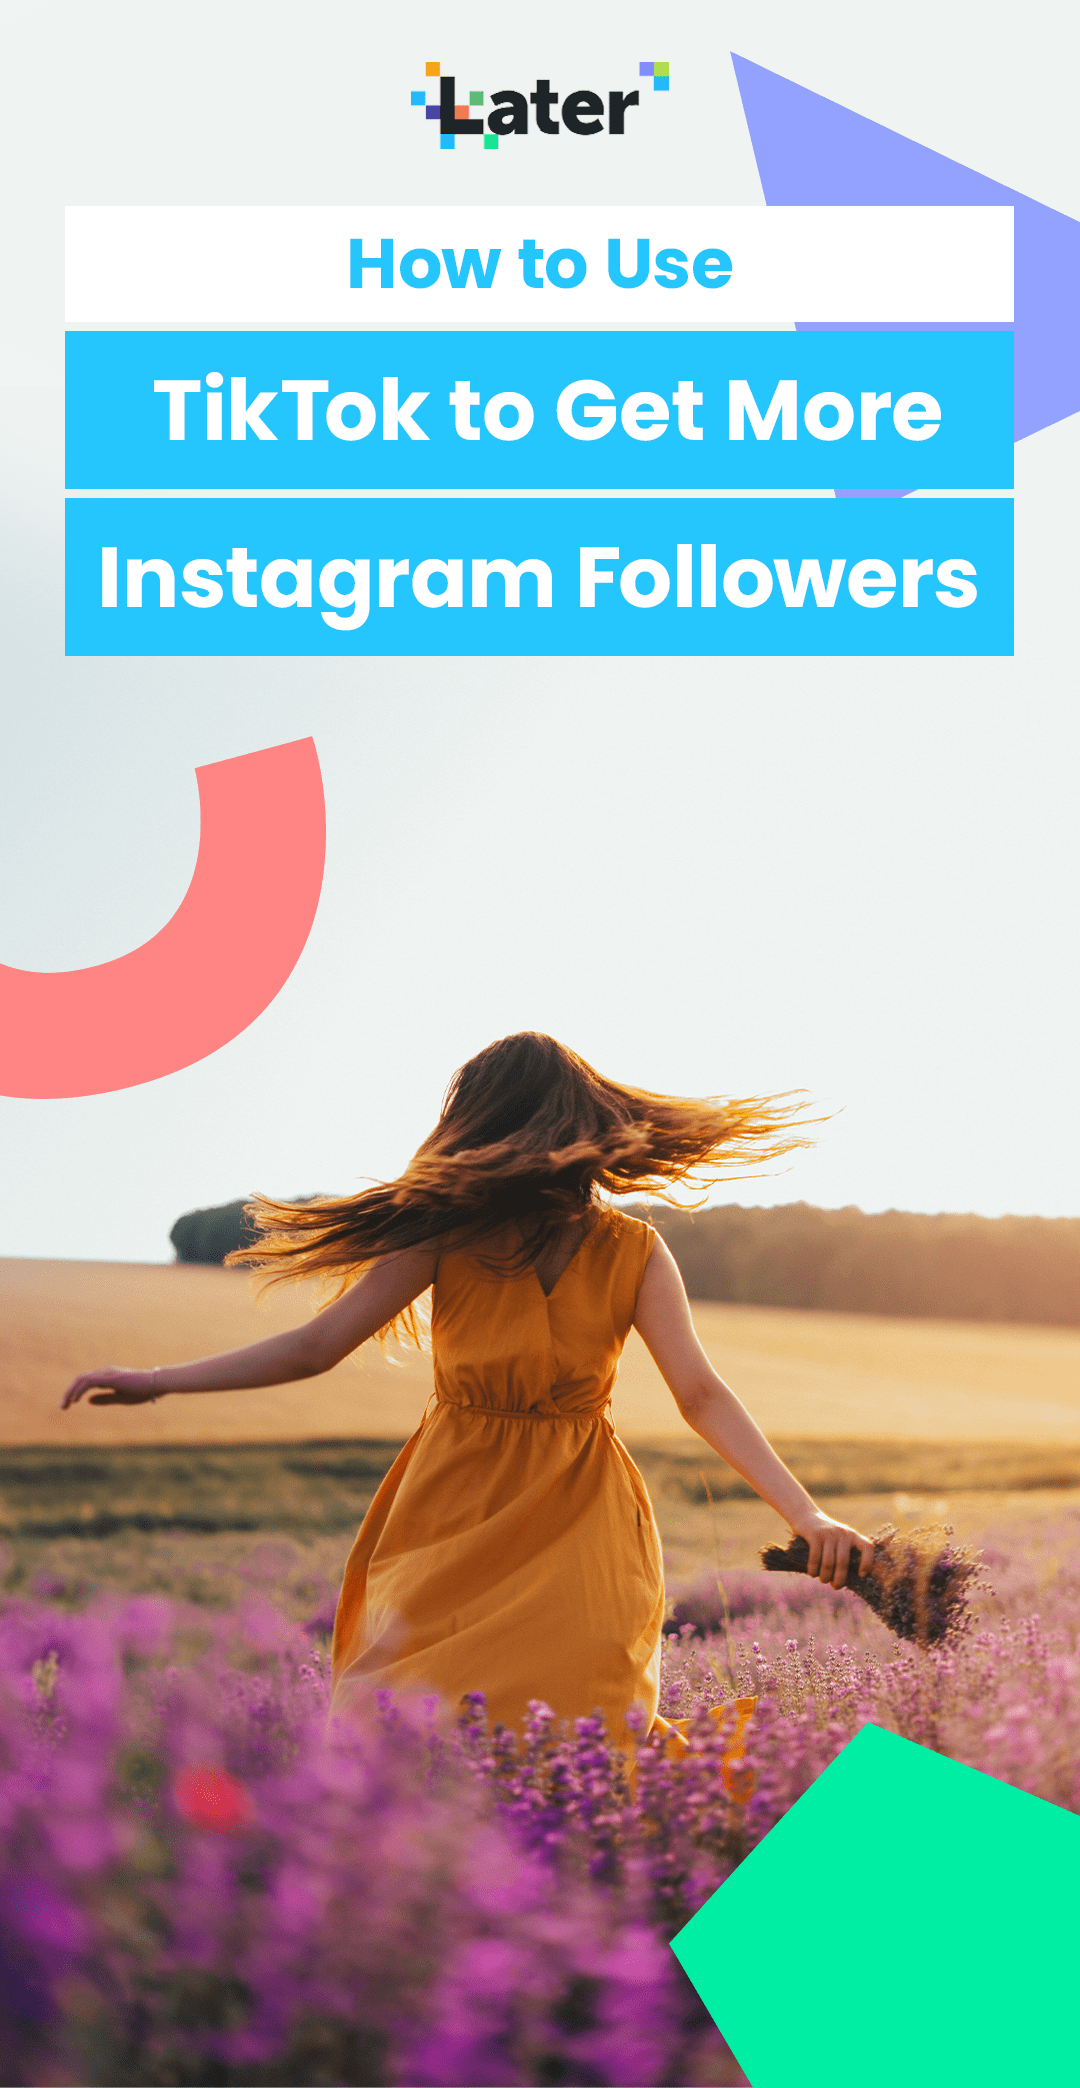 7 Ways To Convert Your Tiktok Audience Into Instagram Followers In 2020 Get Instagram Followers Instagram Followers Instagram Traffic